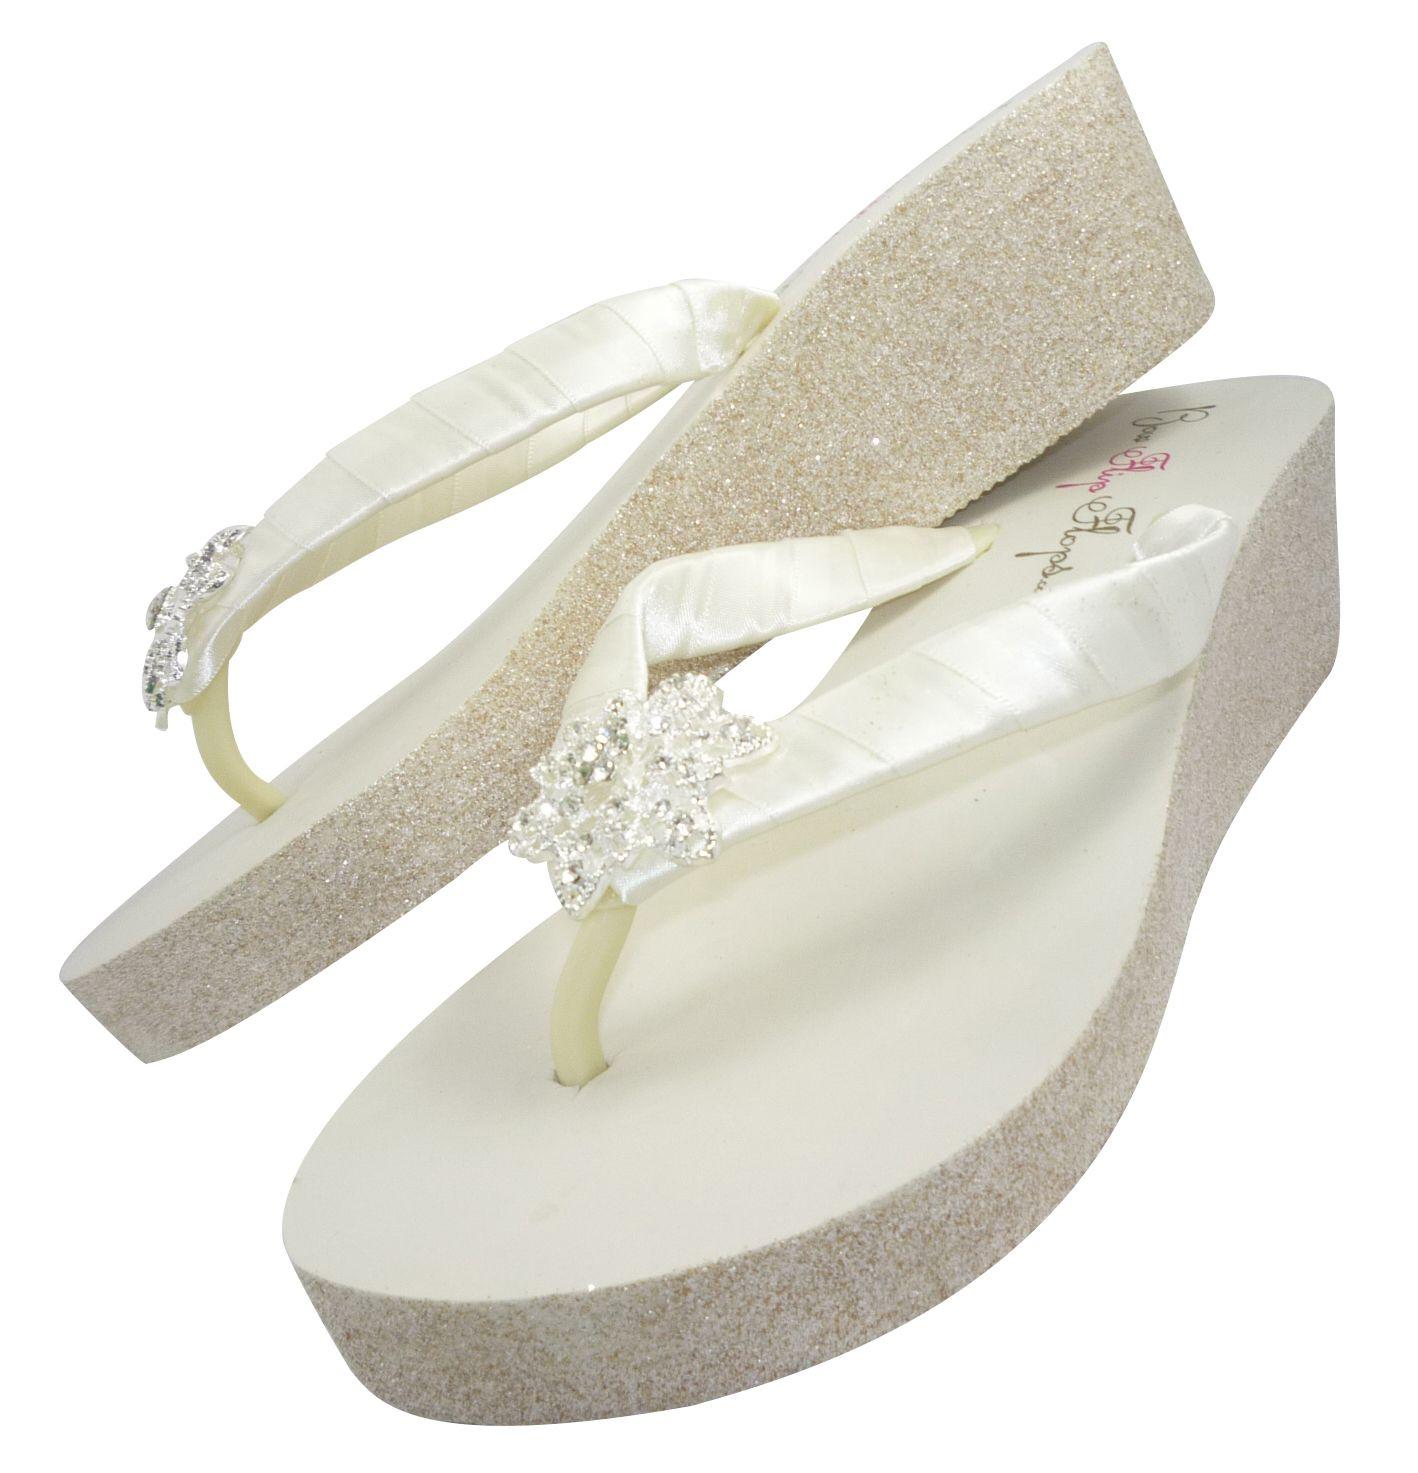 Glitter Wedge Wedding Flip Flops Vintage Flower Ivory White Heel Champagne Gold Silver White Wedge Flip Flops Sparkly Flip Flops Wedding Flip Flops